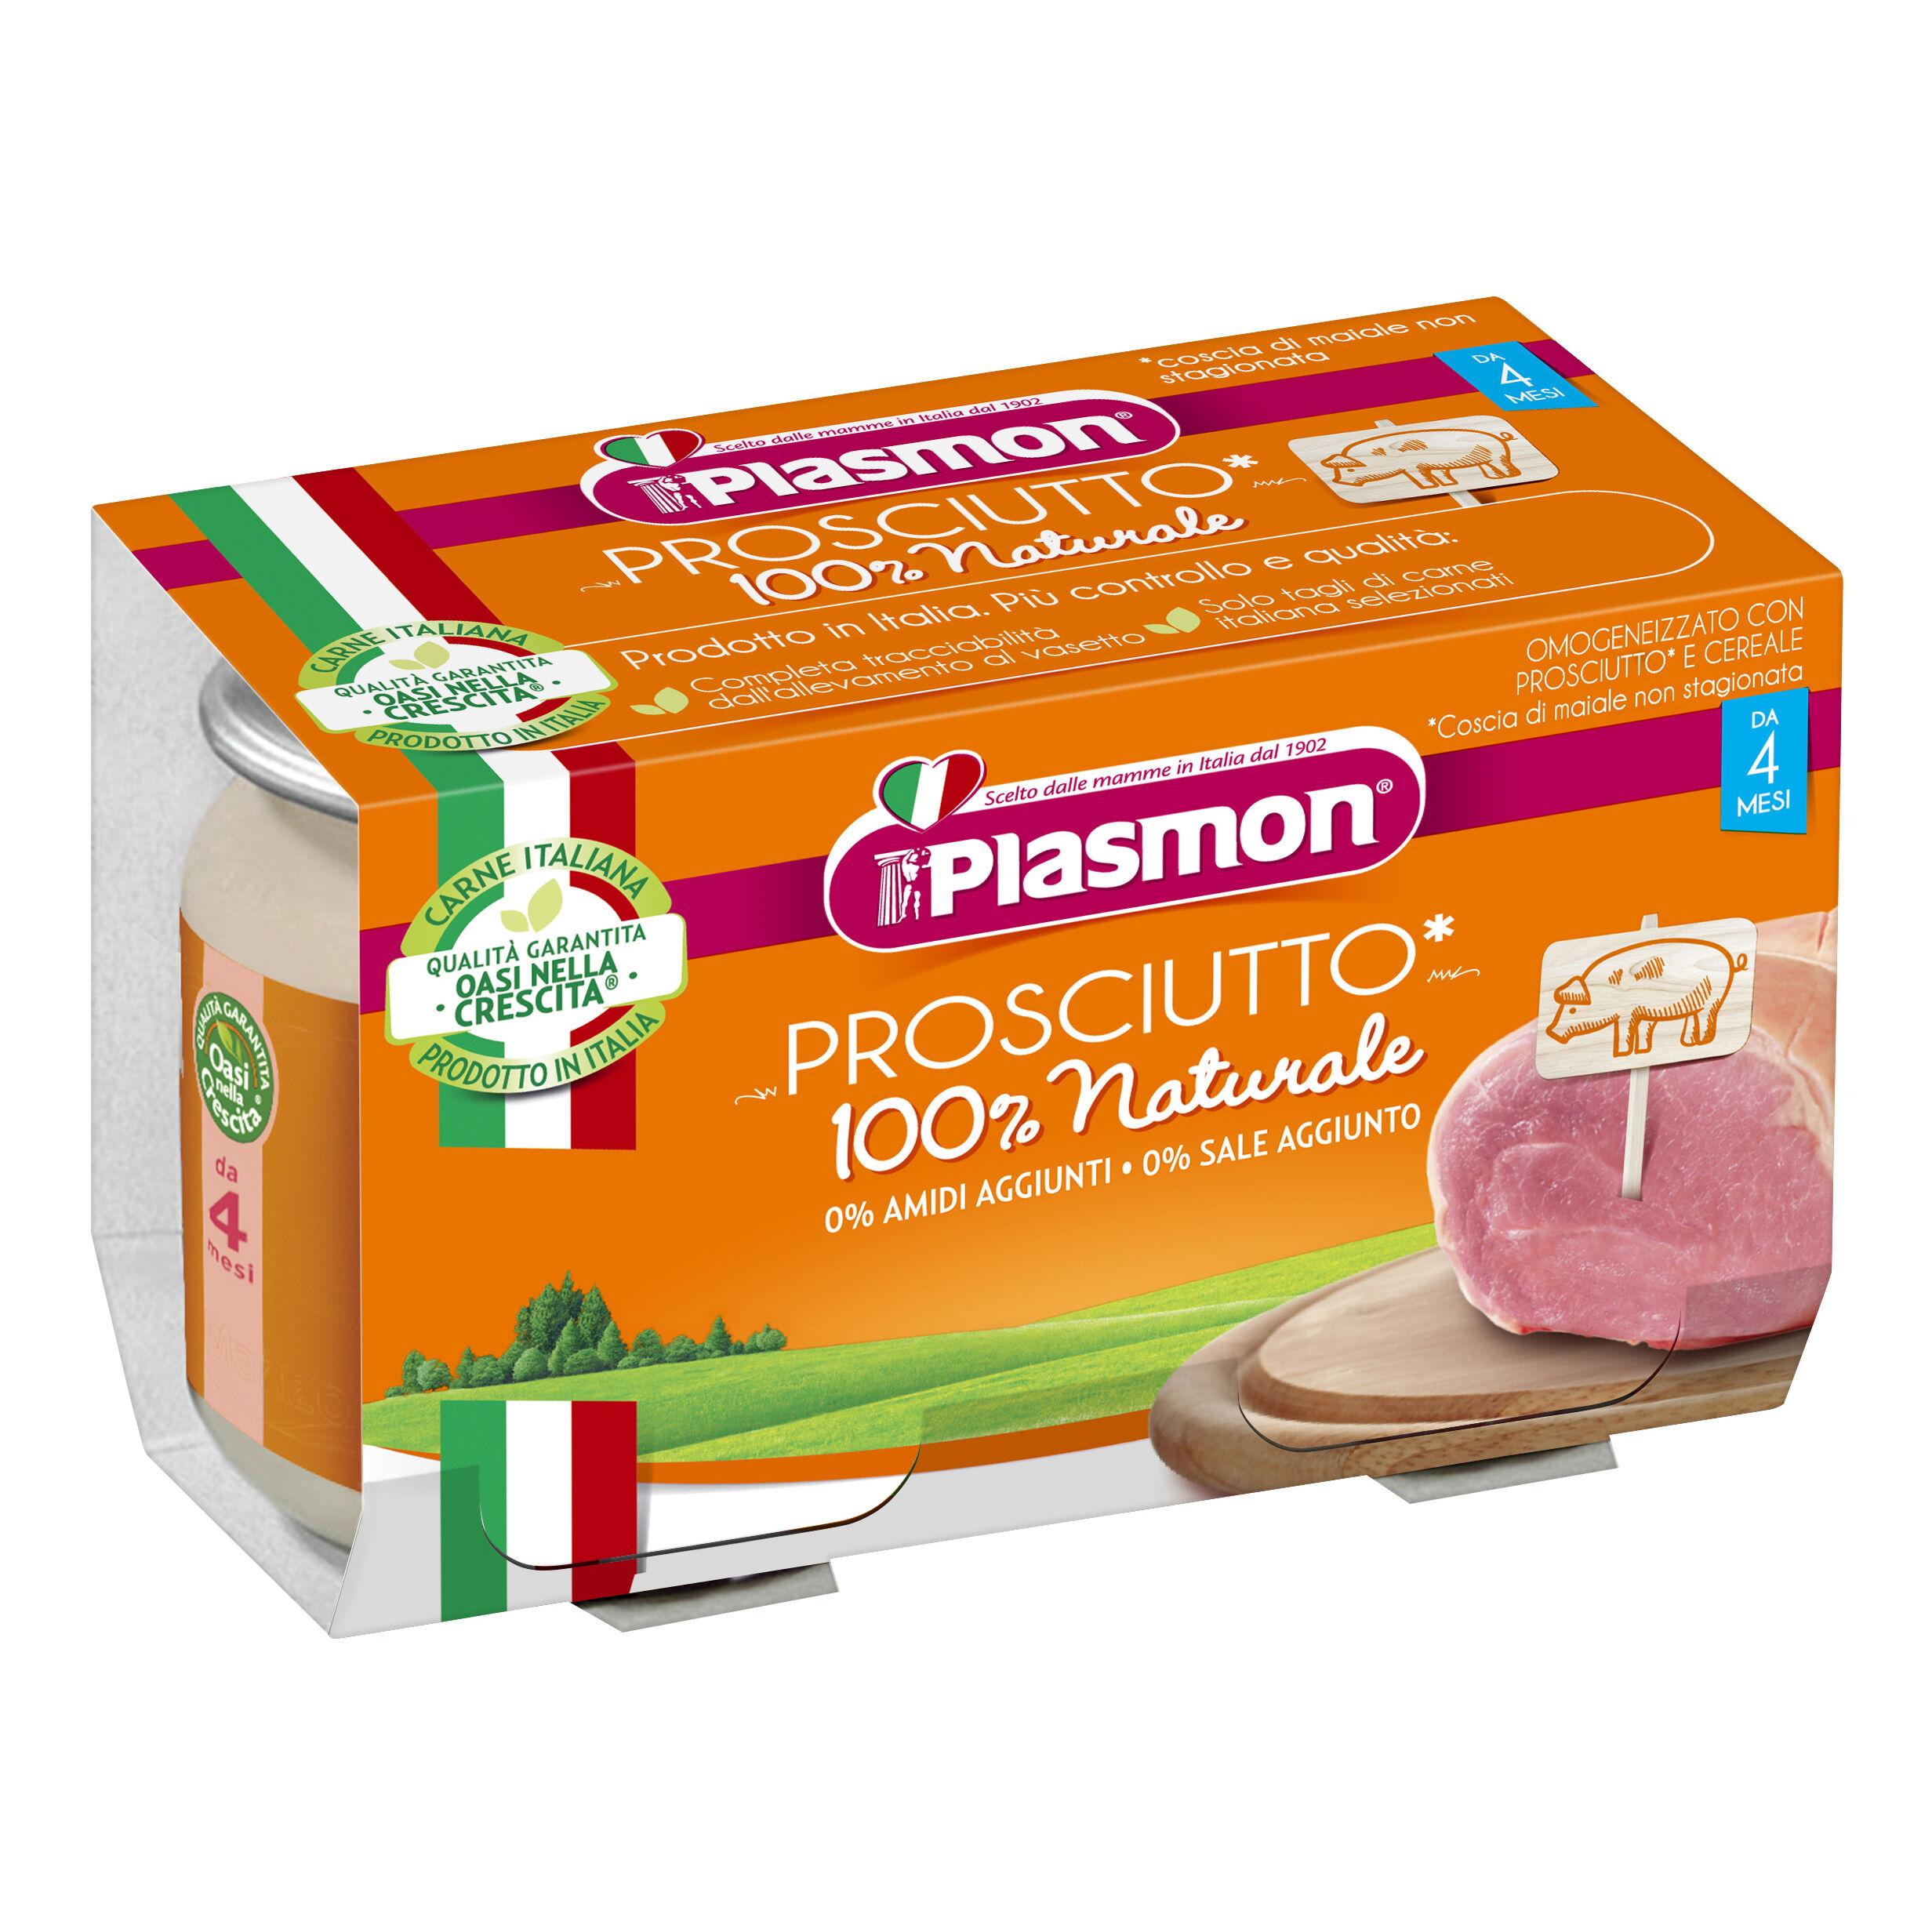 plasmon (heinz italia spa) omo pl.prosciutto 2x120g